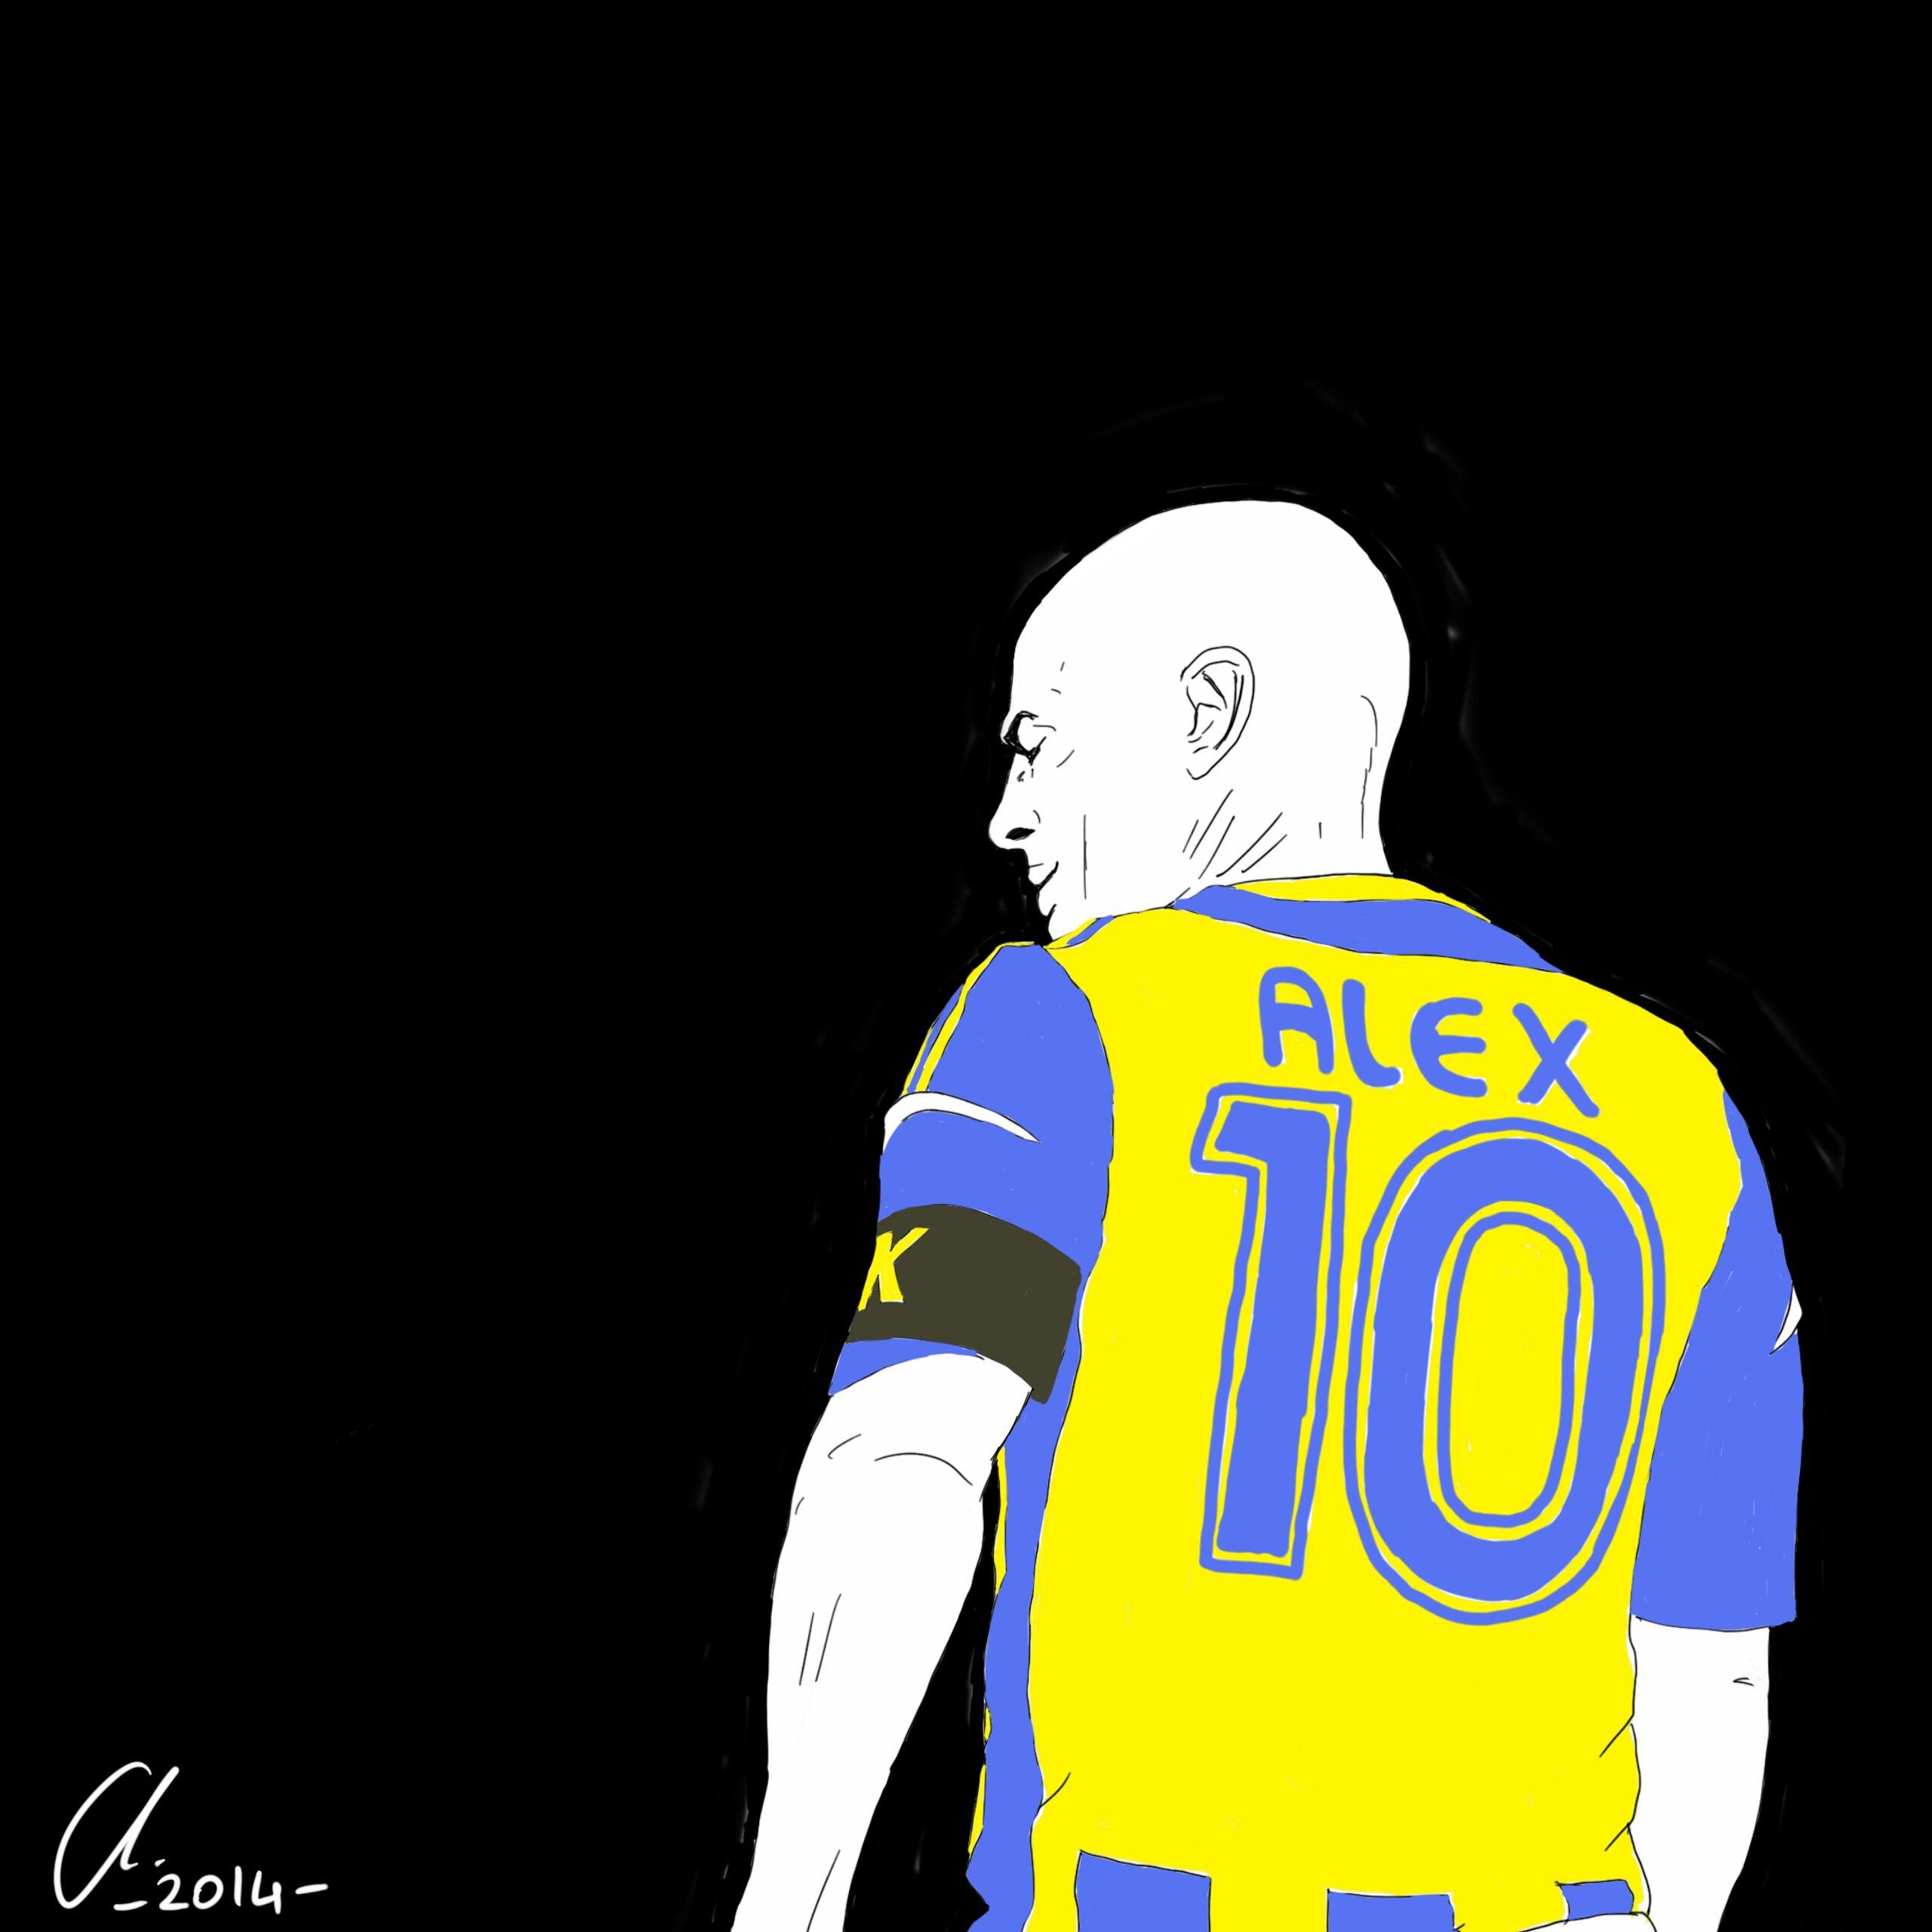 Alex De Souza Futbol Brasil Fenerbahce Brezilya Sultan Sulu